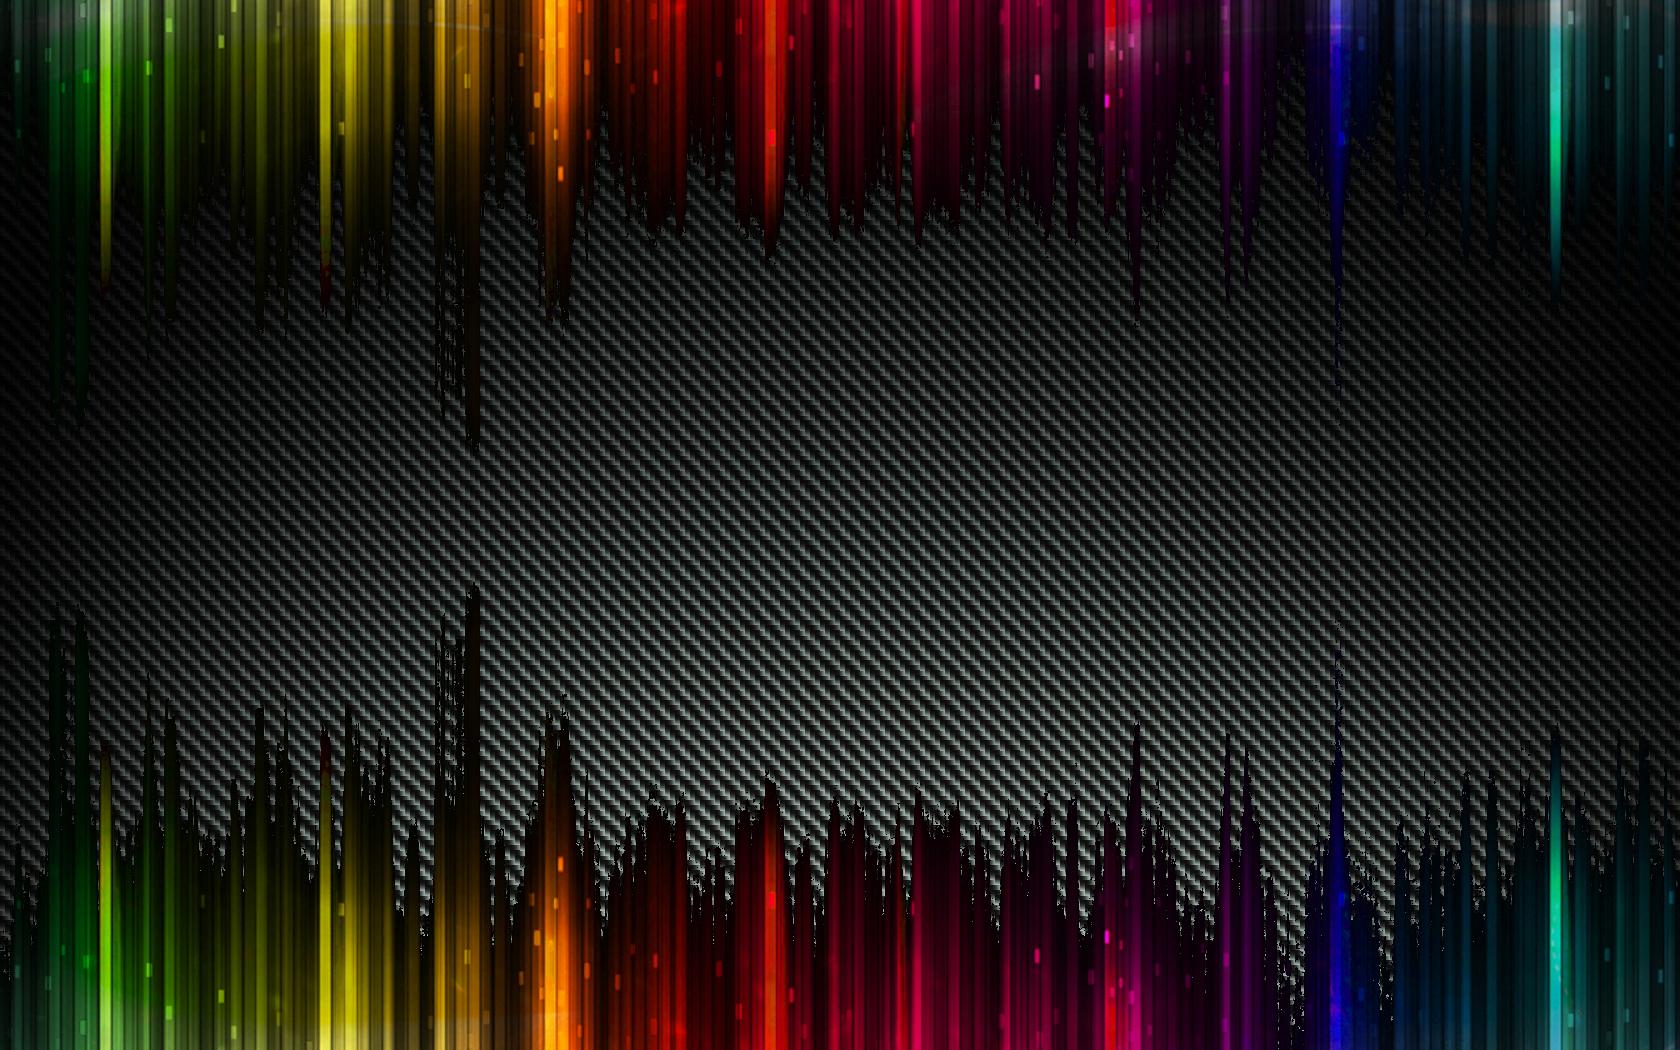 carbon fiber background that I made by Chip-d3 on DeviantArt